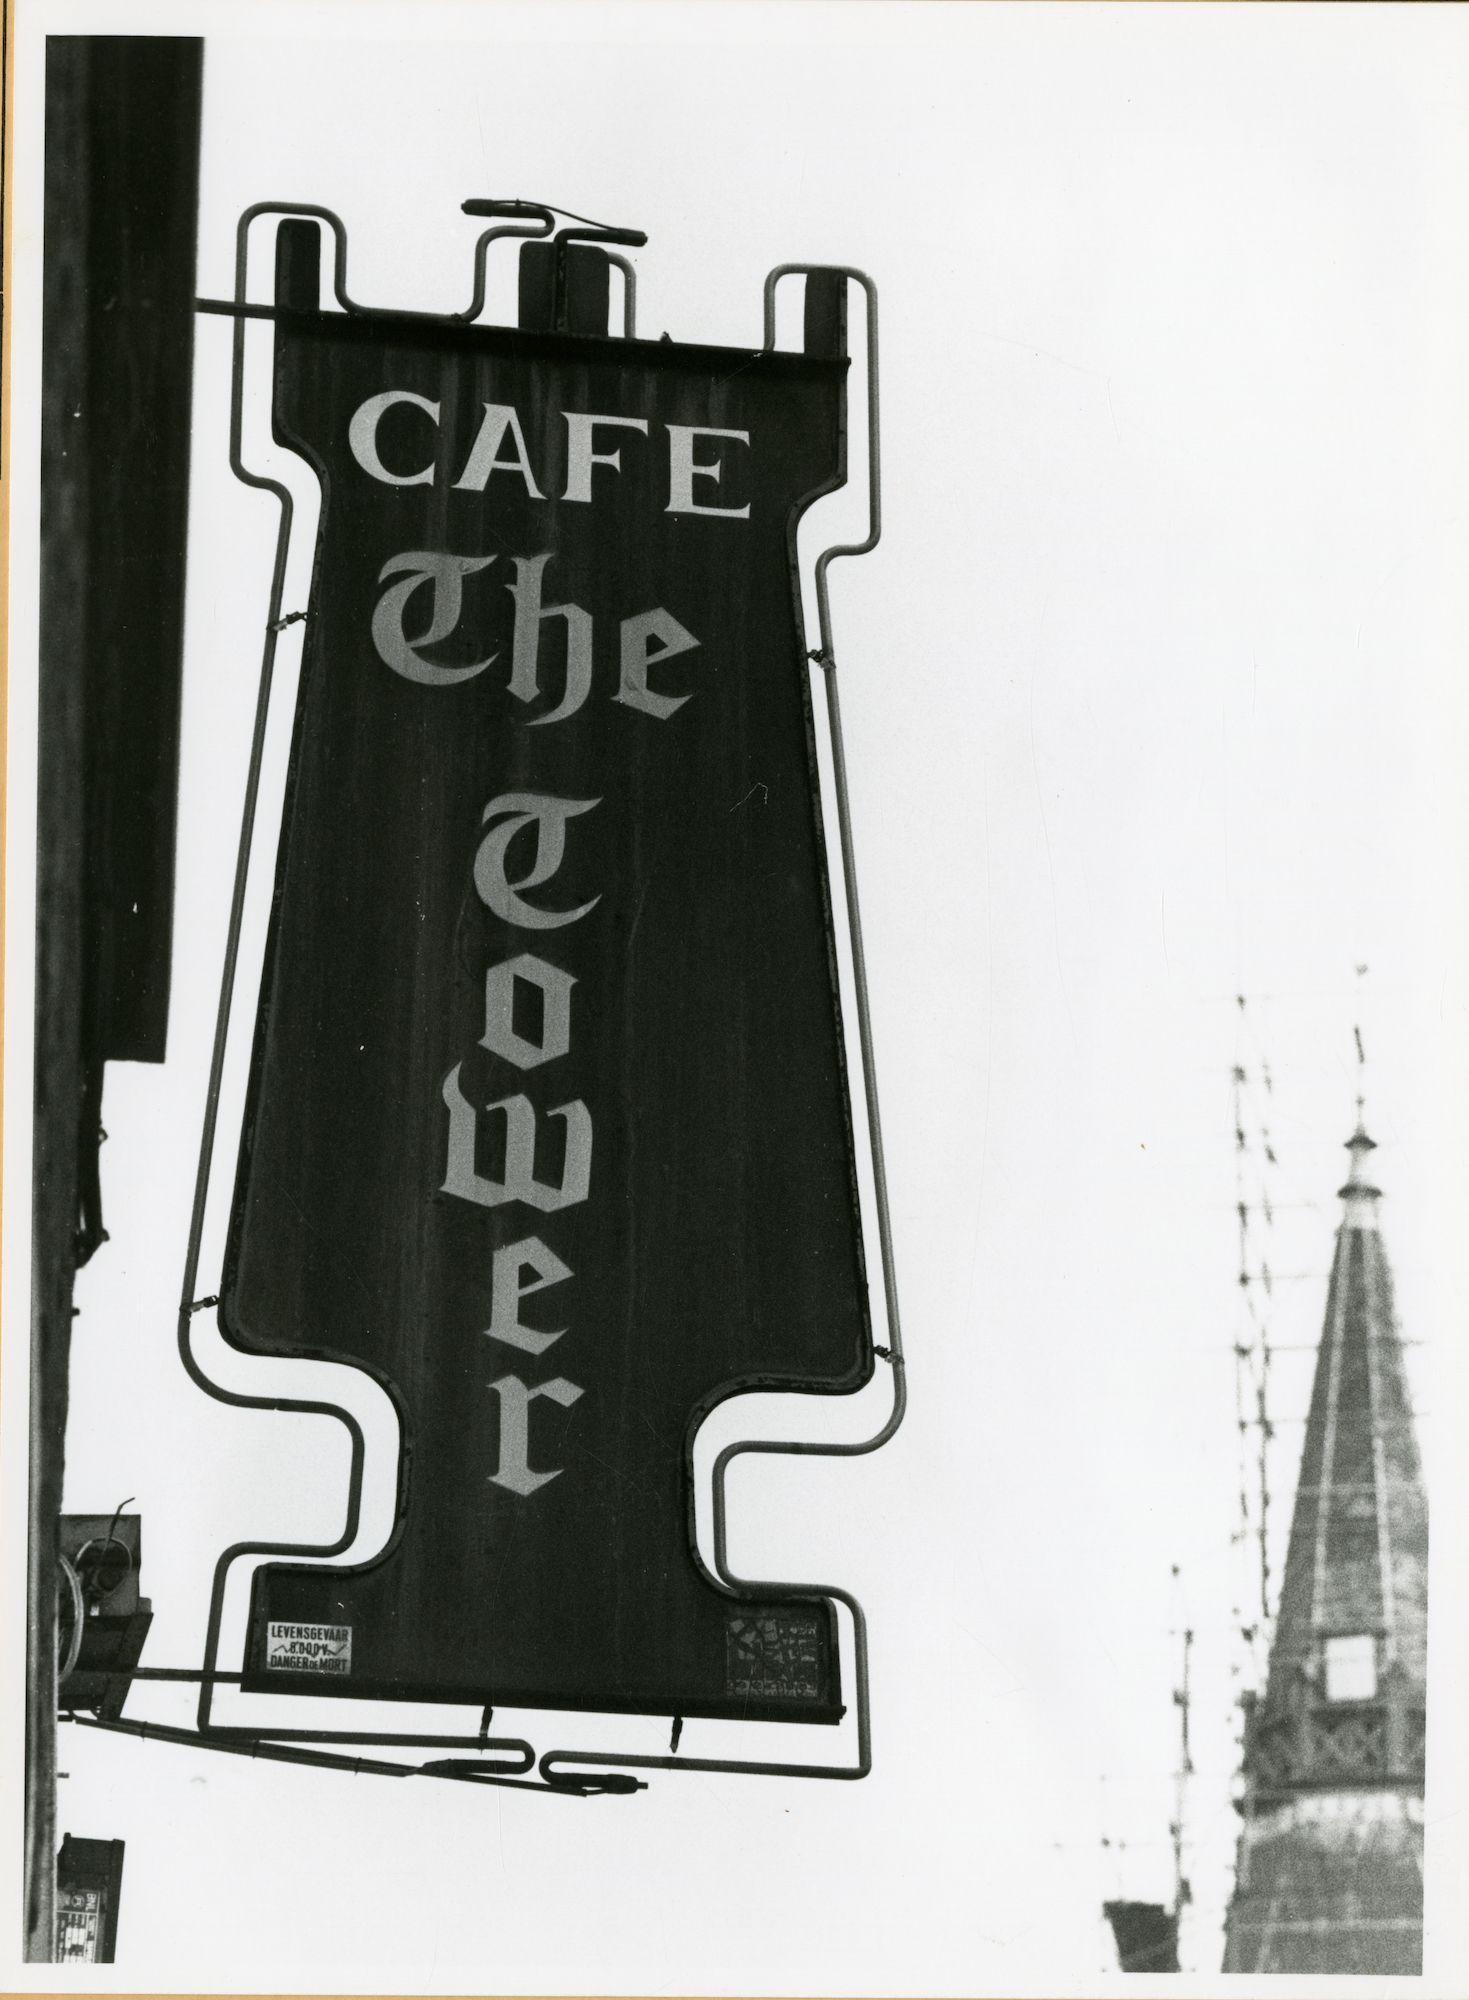 Gent: Bevrijdingslaan 58: Café The Tower: uithangbord, 1979